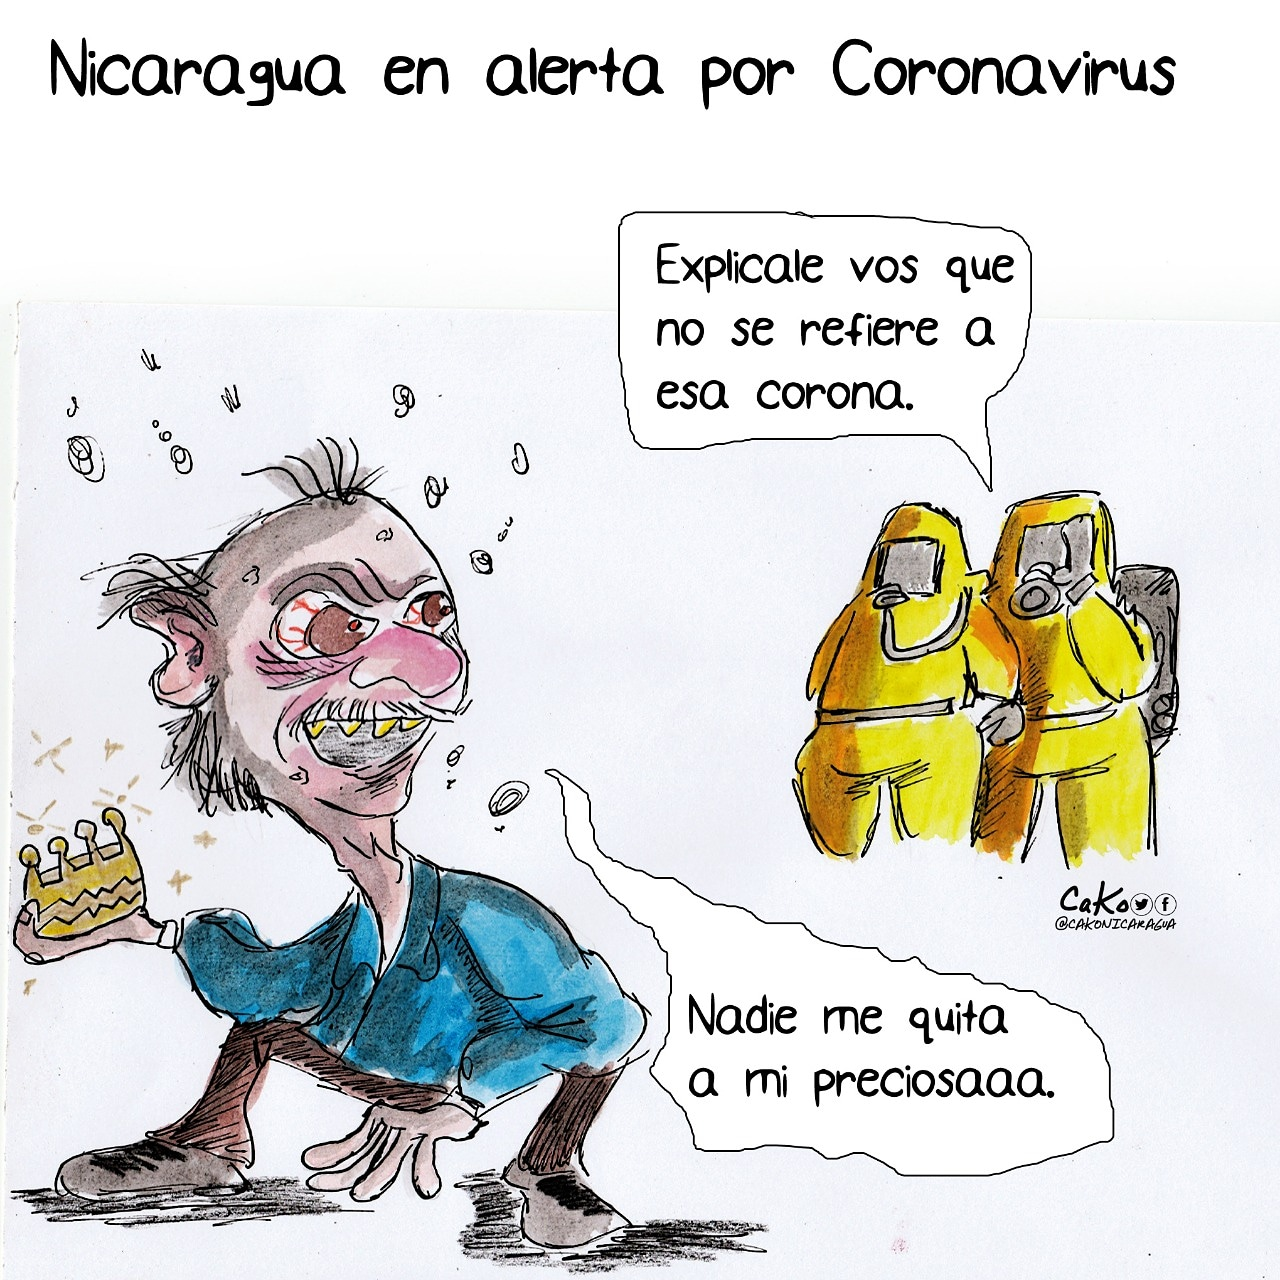 La Caricatura: Alerta por el coronavirus